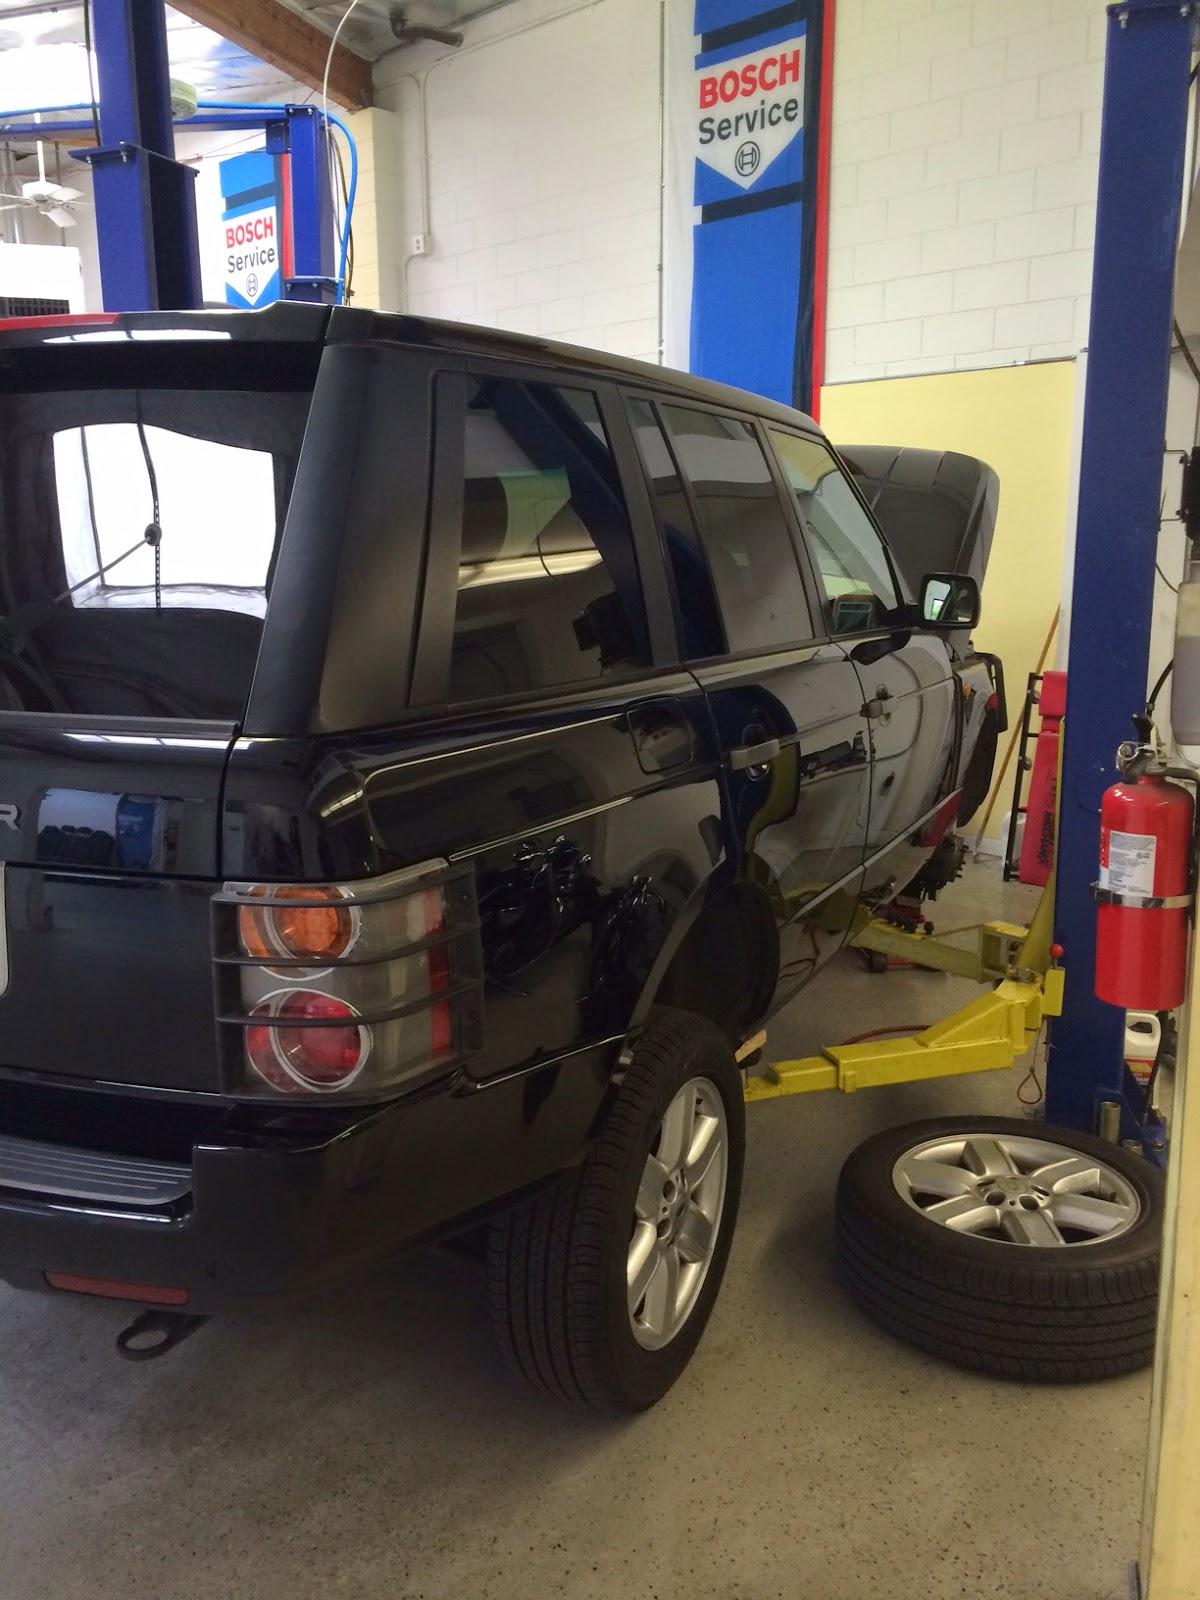 Bosch European Motors Range Rover Service Repair and Consignment